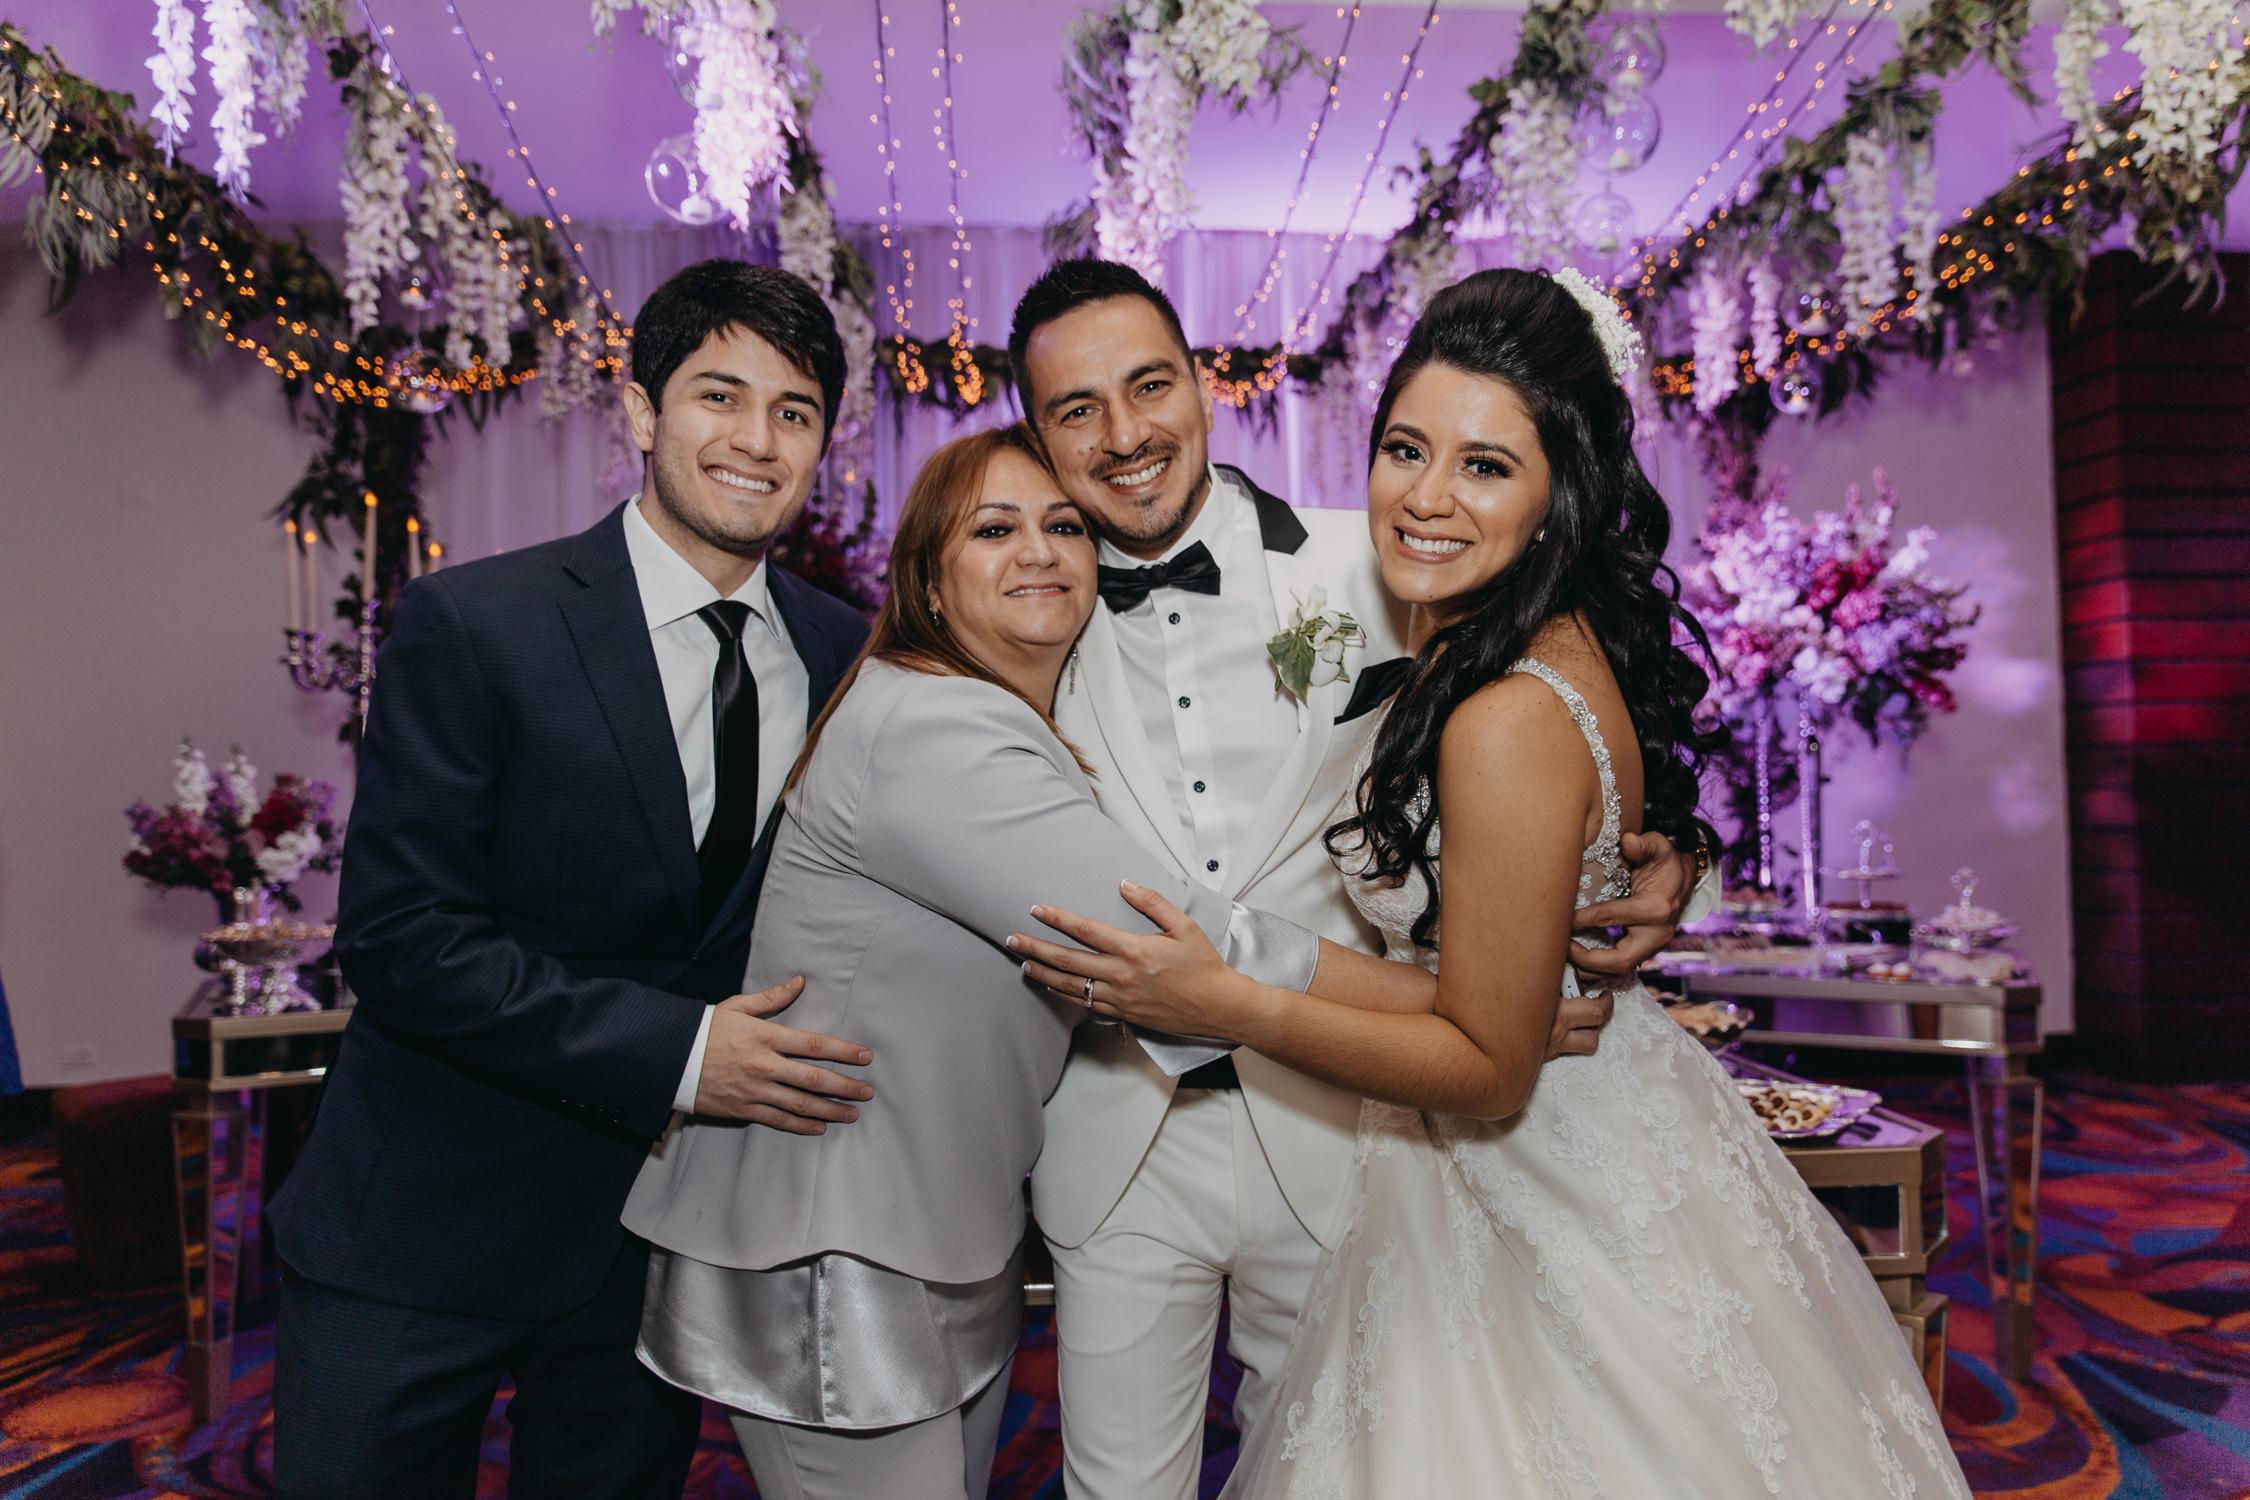 Michelle-Agurto-Fotografia-Bodas-Ecuador-Destination-Wedding-Photographer-Daniela-Dirk-62.JPG